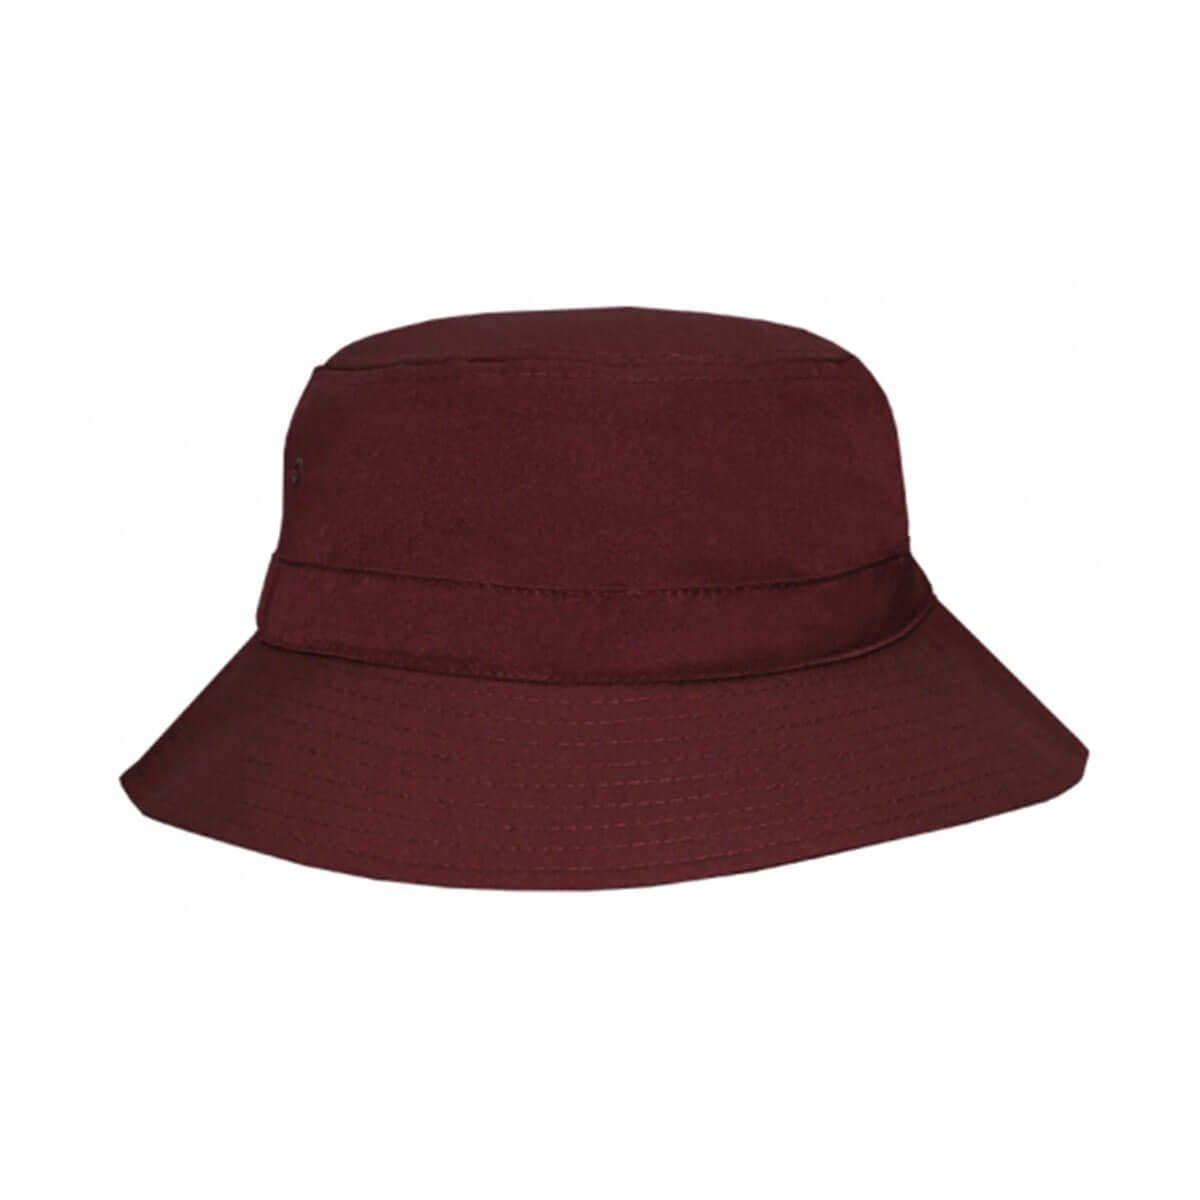 Polyviscose Bucket Hat-Maroon